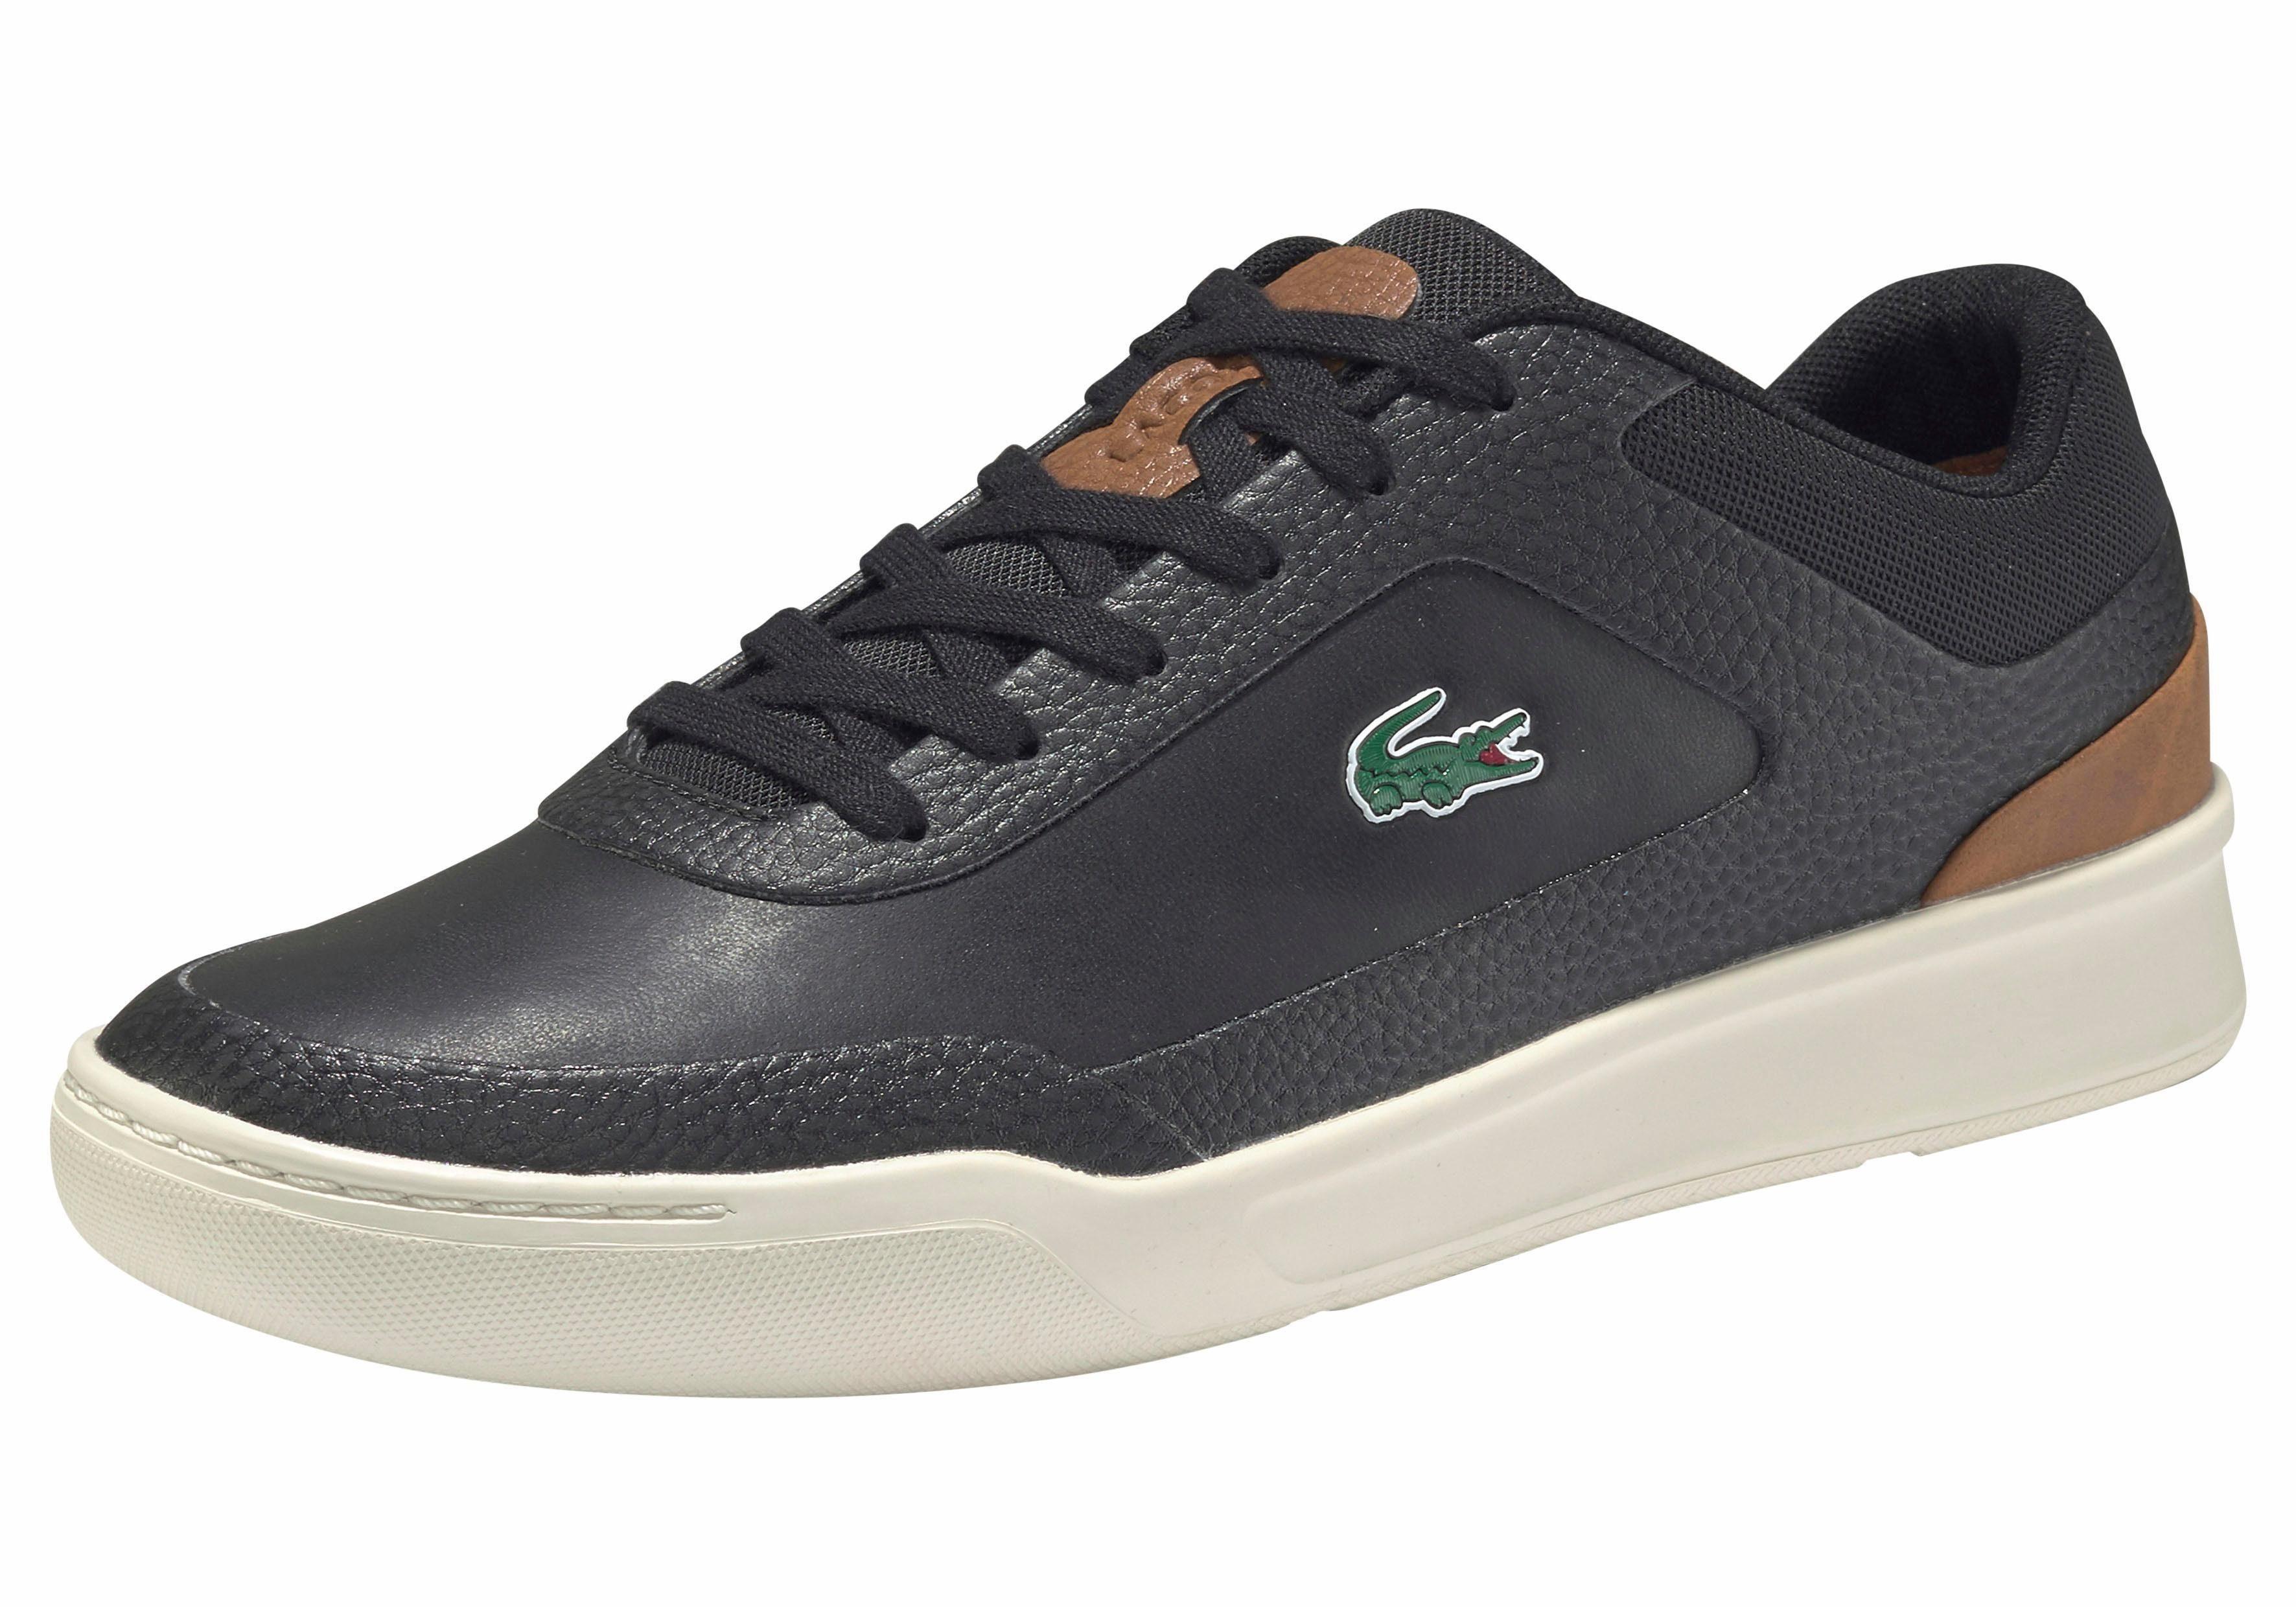 Lacoste Explorateur SPT LO Sneaker online kaufen  schwarz-braun